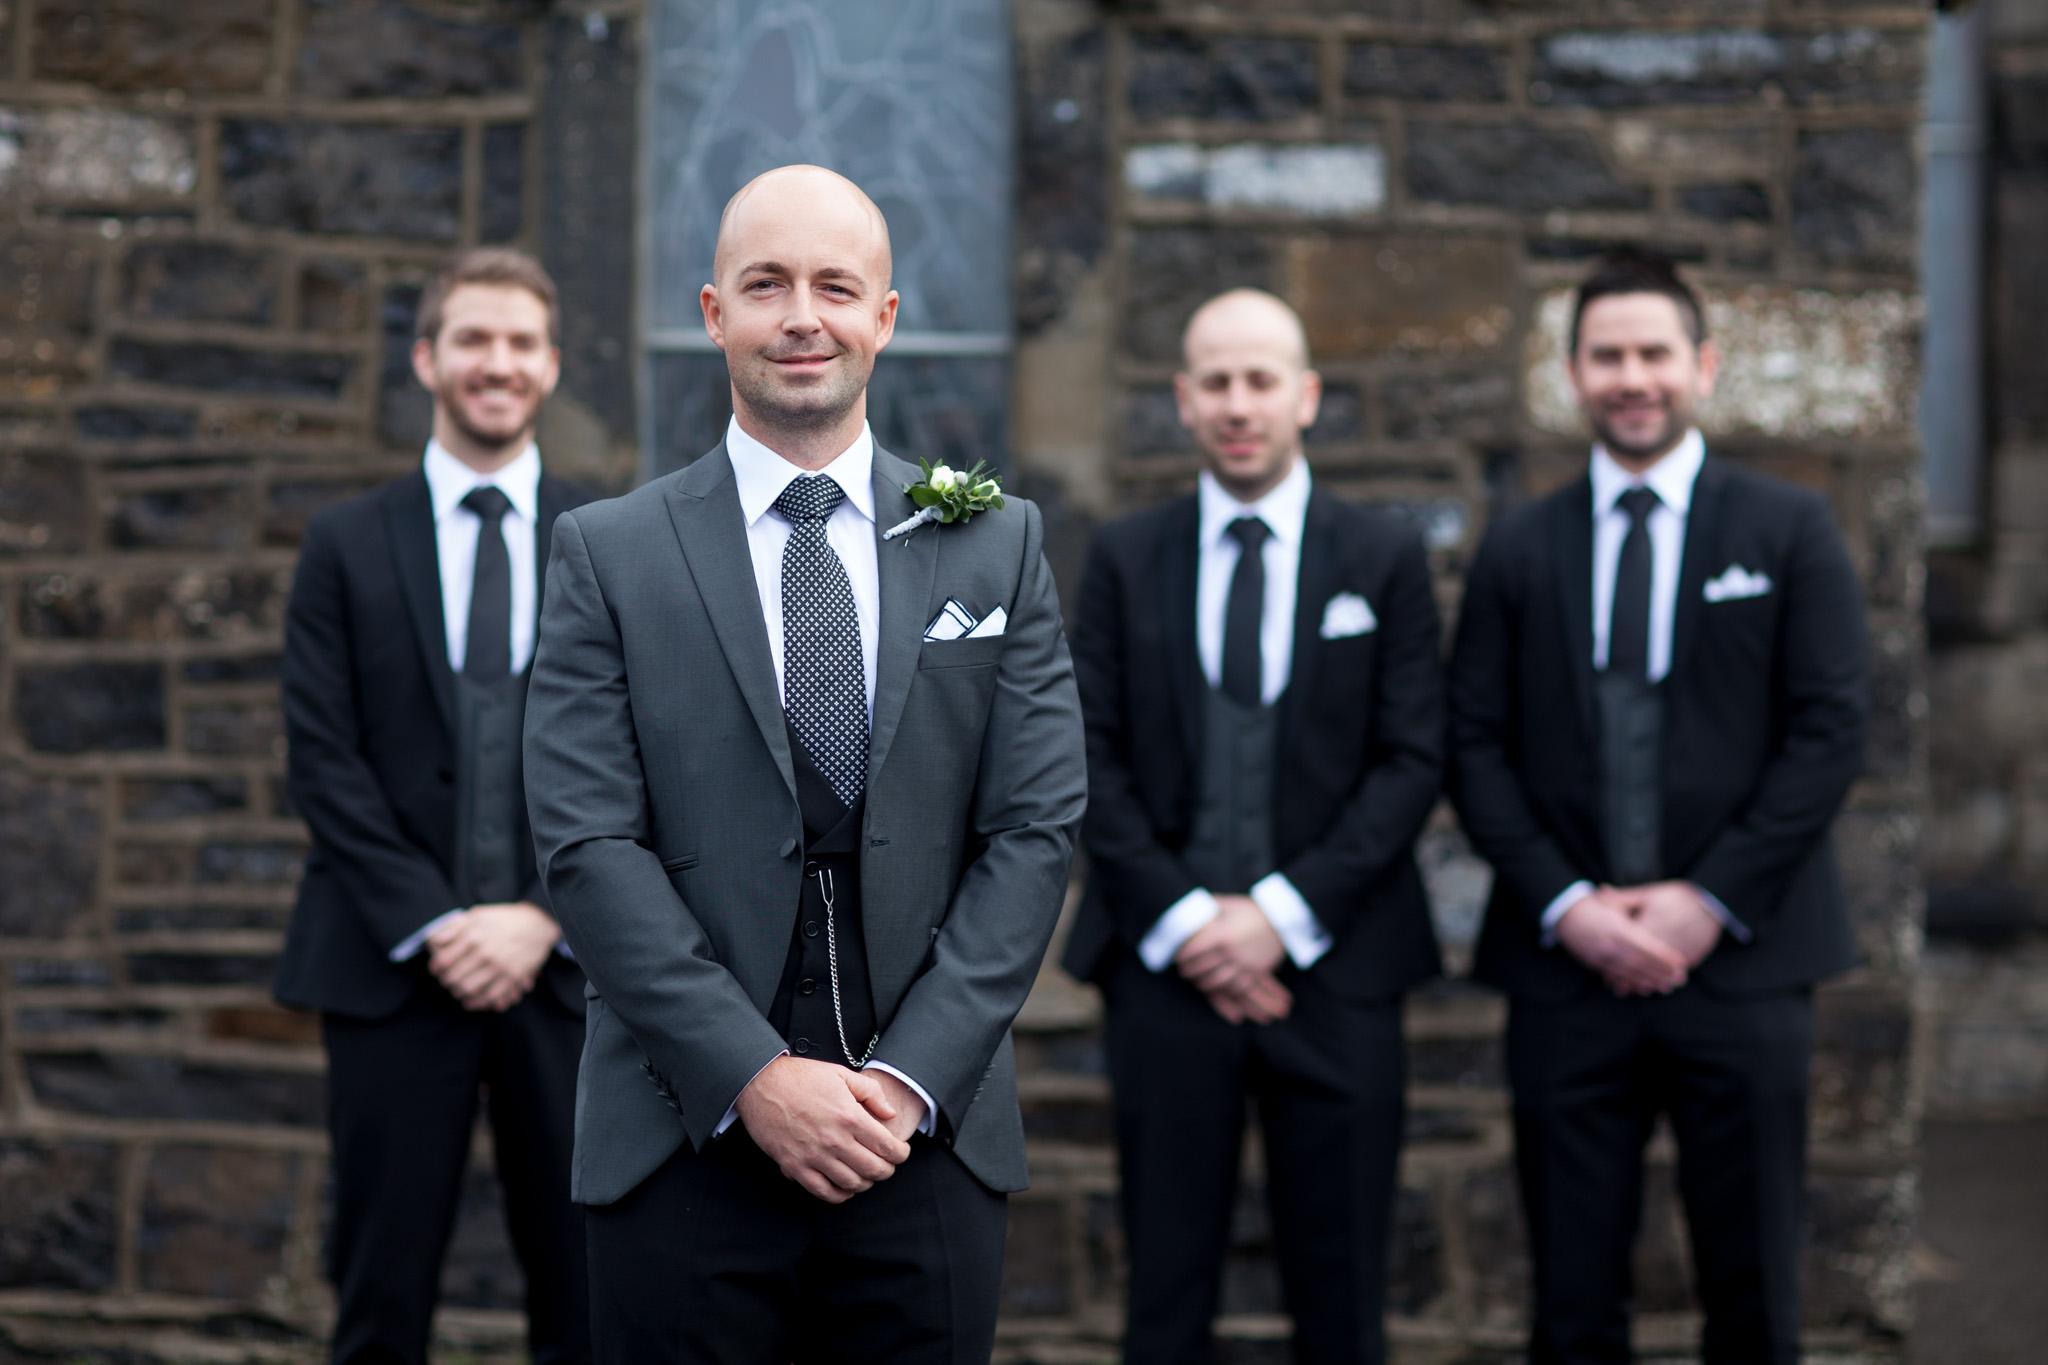 Mark_Barnes_Northern_Ireland_wedding_photographer_Harveys_Point_Donegall_Wedding_photography-Adam&Gemma-14.jpg